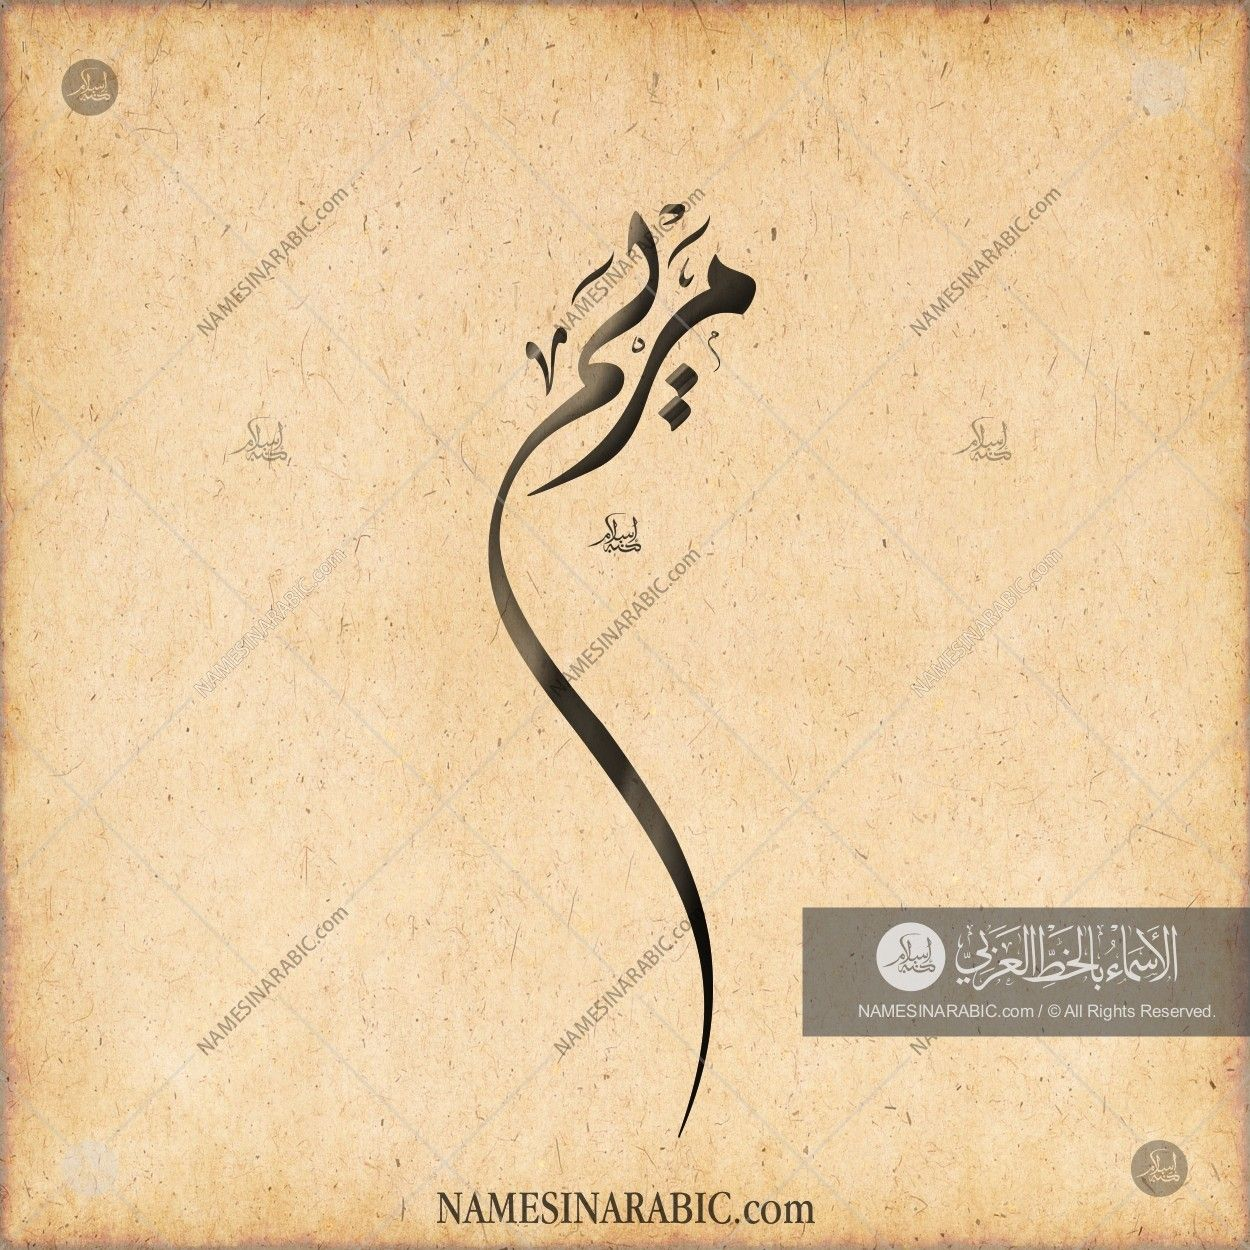 Maryam مريم Names In Arabic Calligraphy Name 8484 Arabic Calligraphy Tattoo Arabic Calligraphy Painting Calligraphy Name